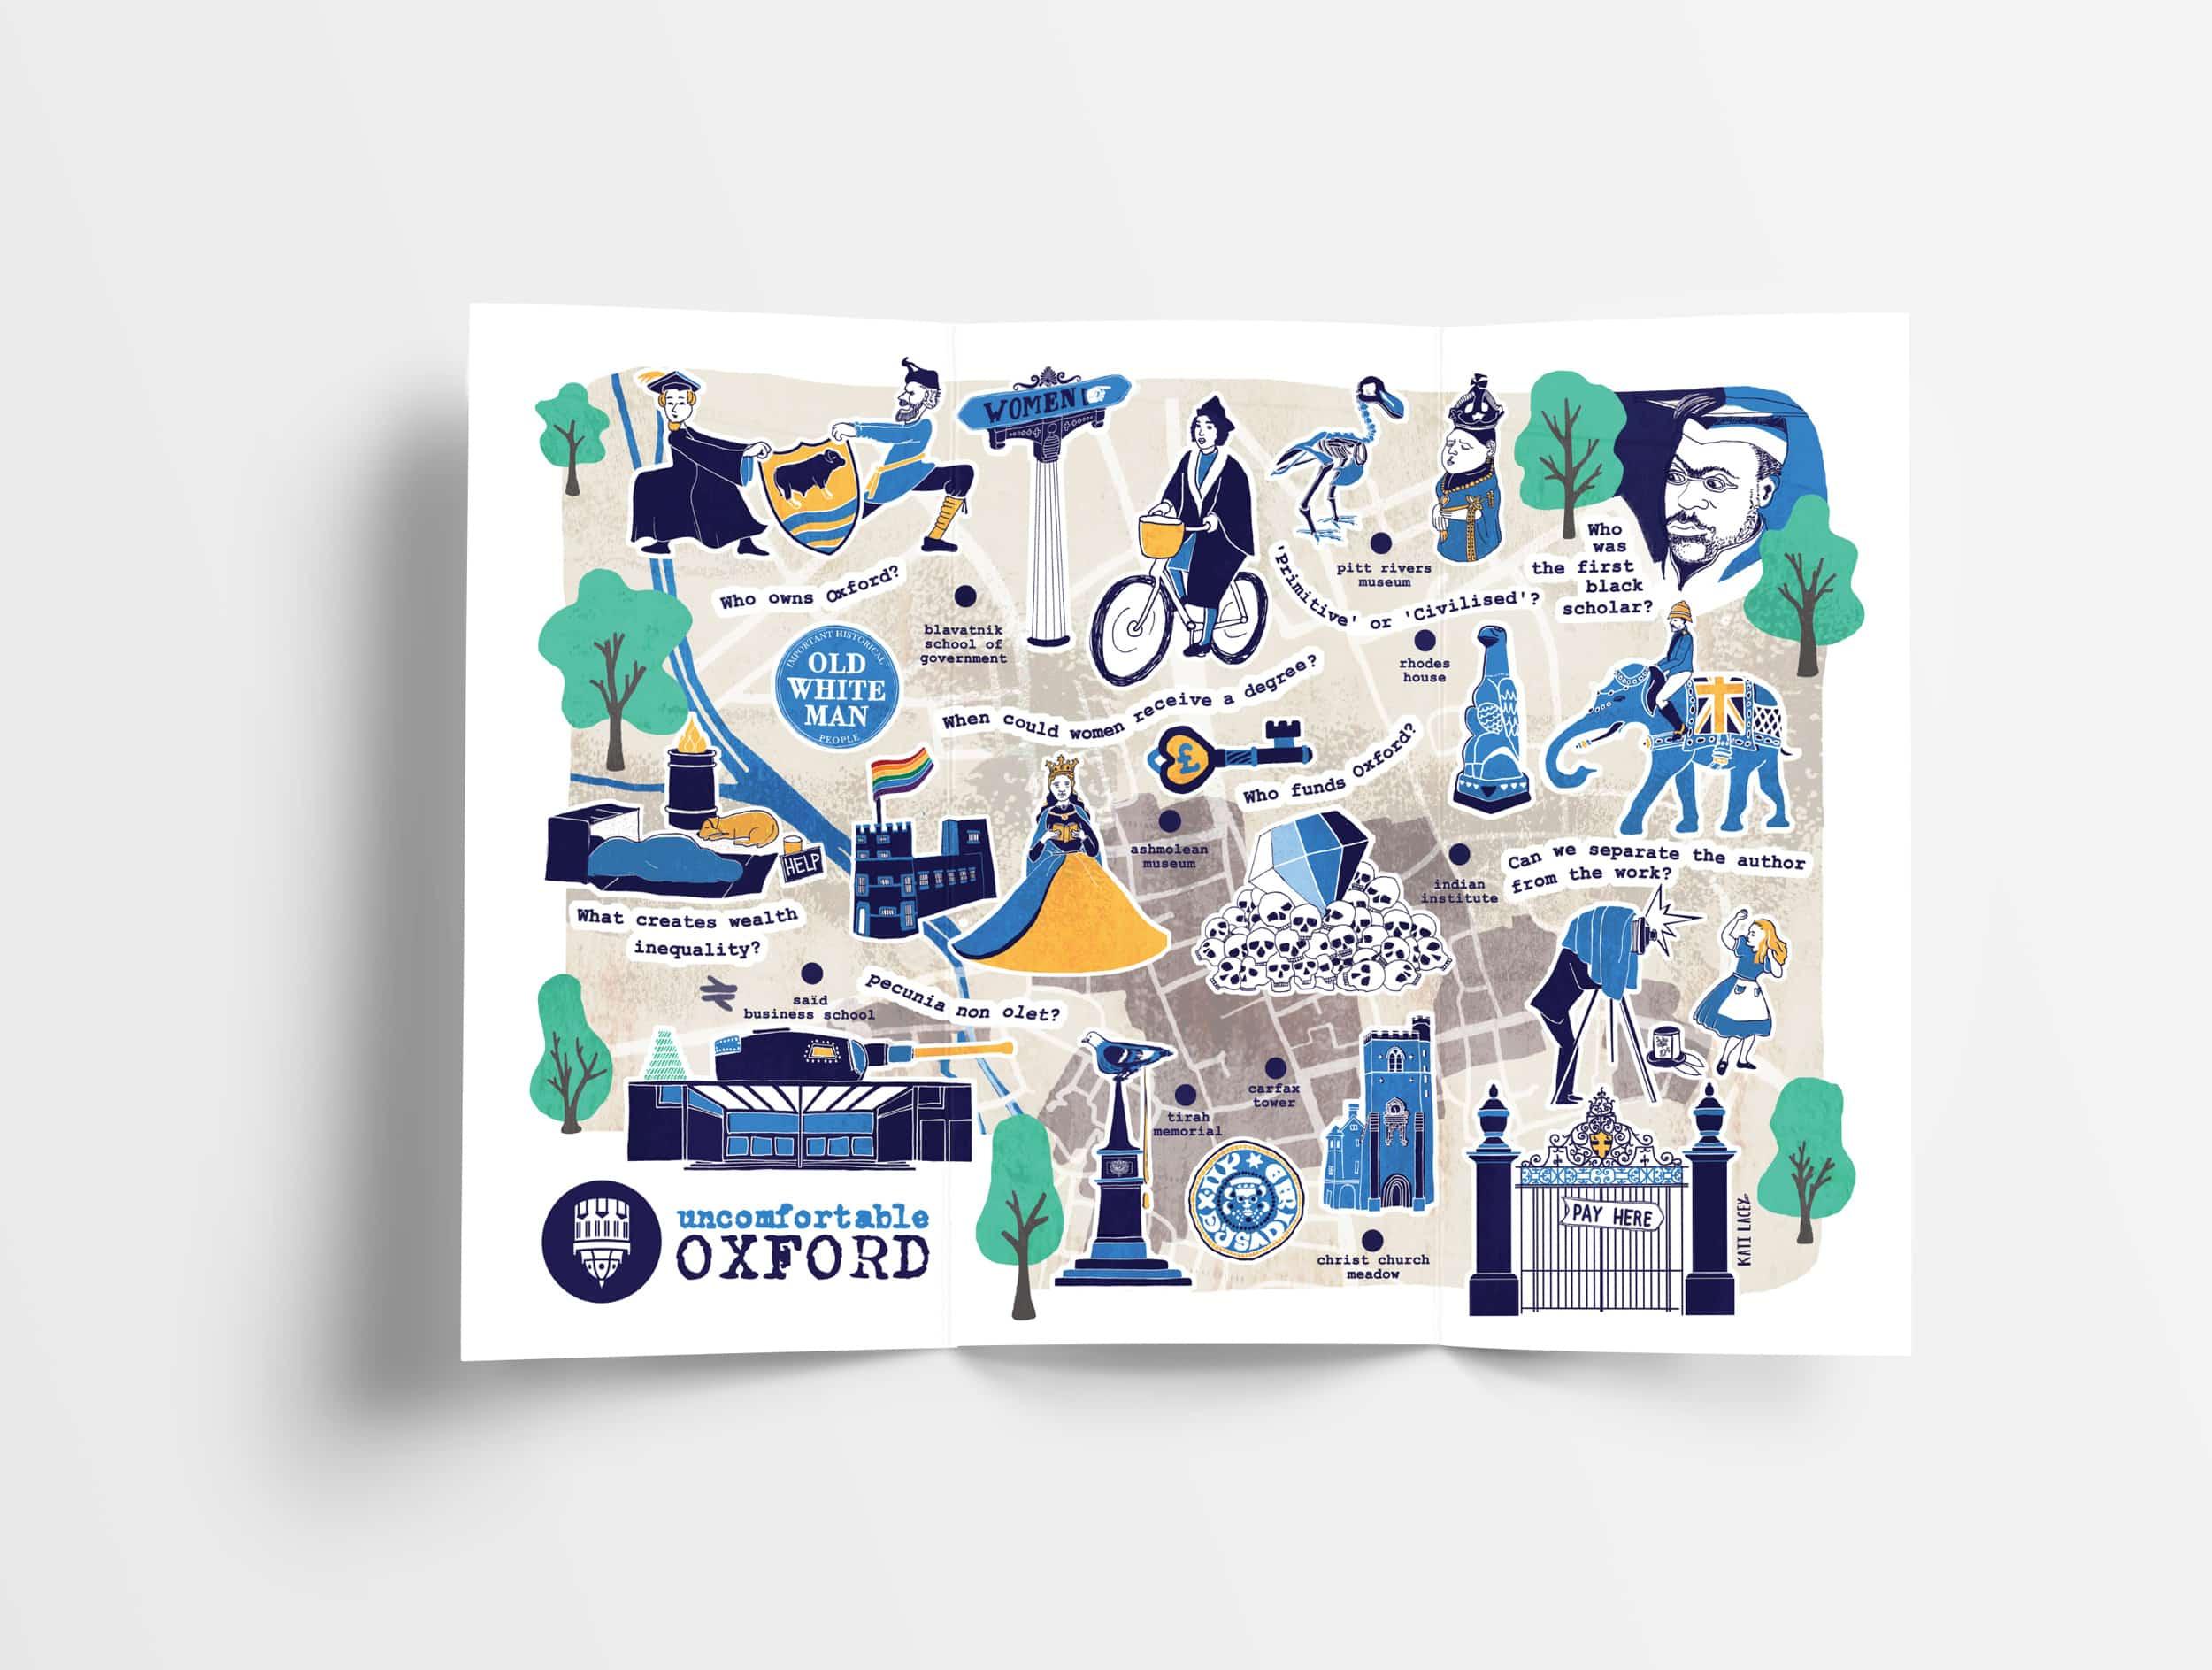 Illustrated-Oxford-map Uncomfortable Oxford Map -fun illustrated map of Oxford- historical facts about Oxford- Oxford histories - Kati Lacey freelance illustrator Oxford